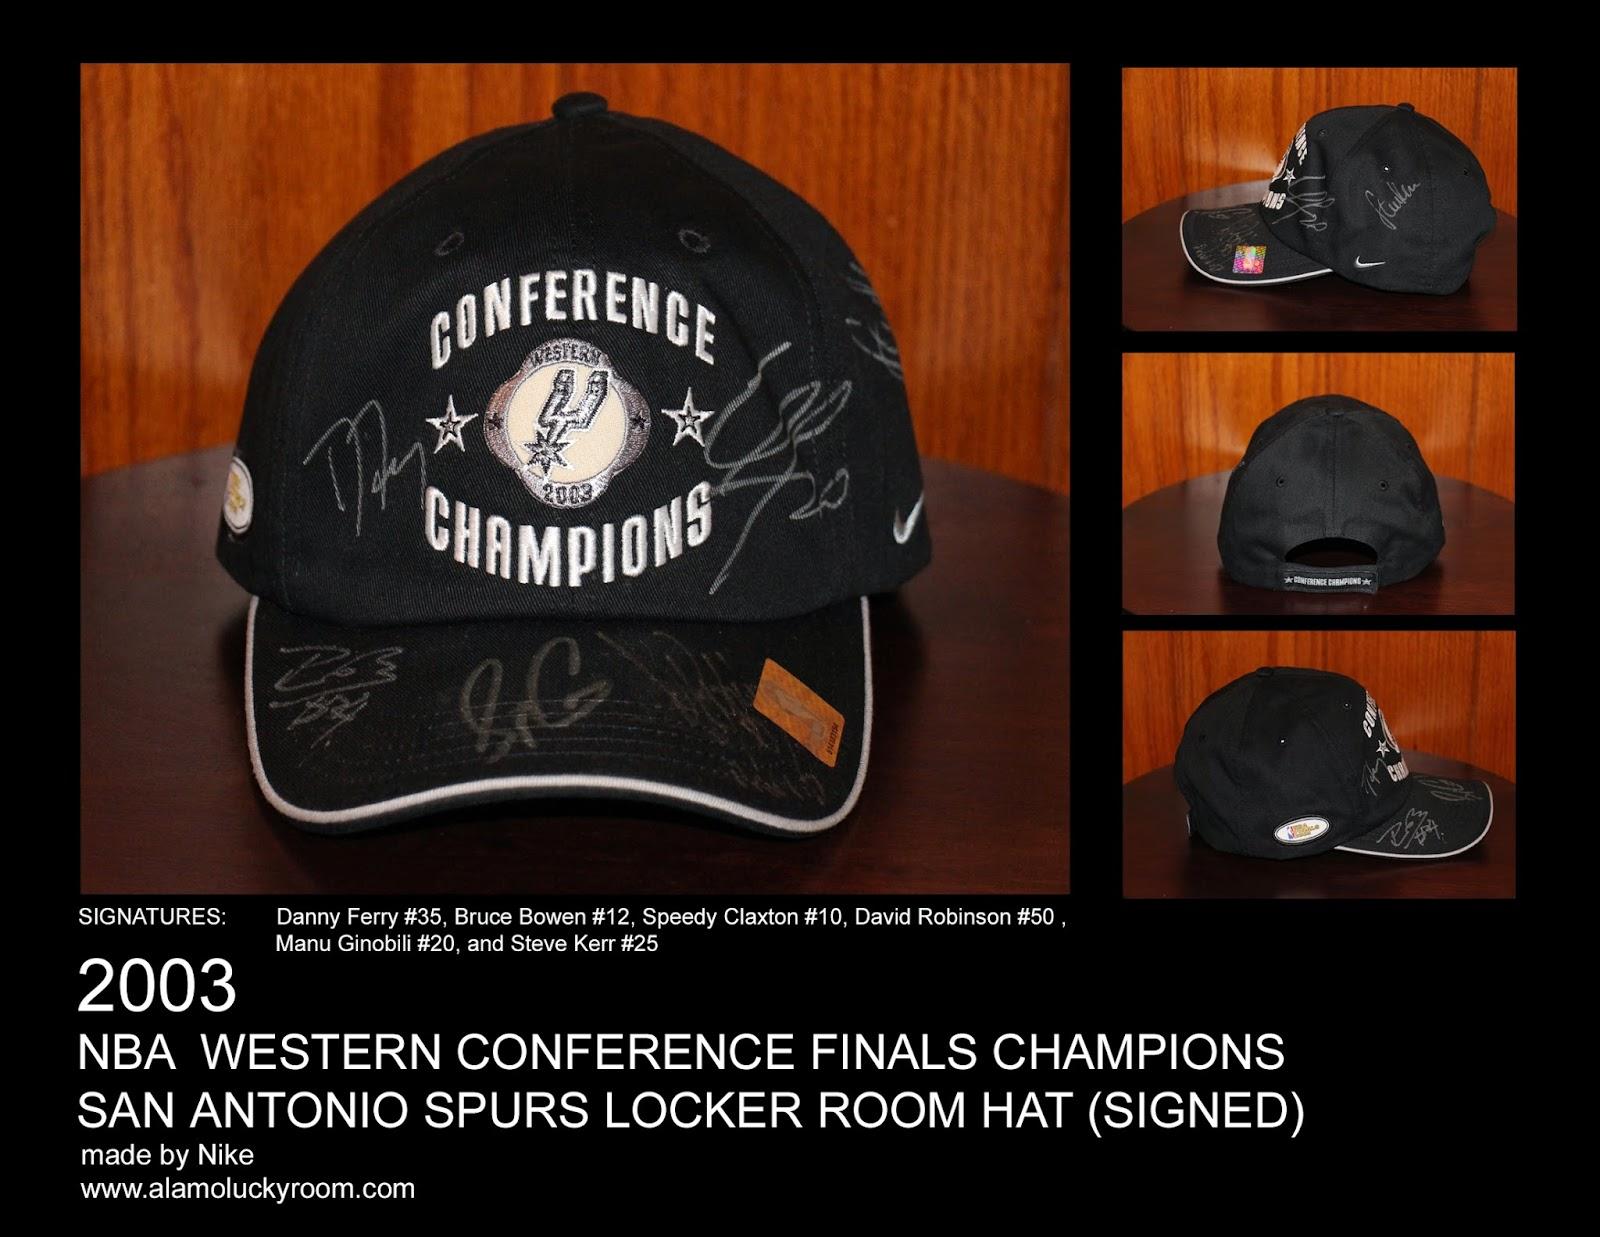 aa9e4ea318e 2003 San Antonio Spurs NBA Western Conference Finals Champions Locker Room  Hat (signed)